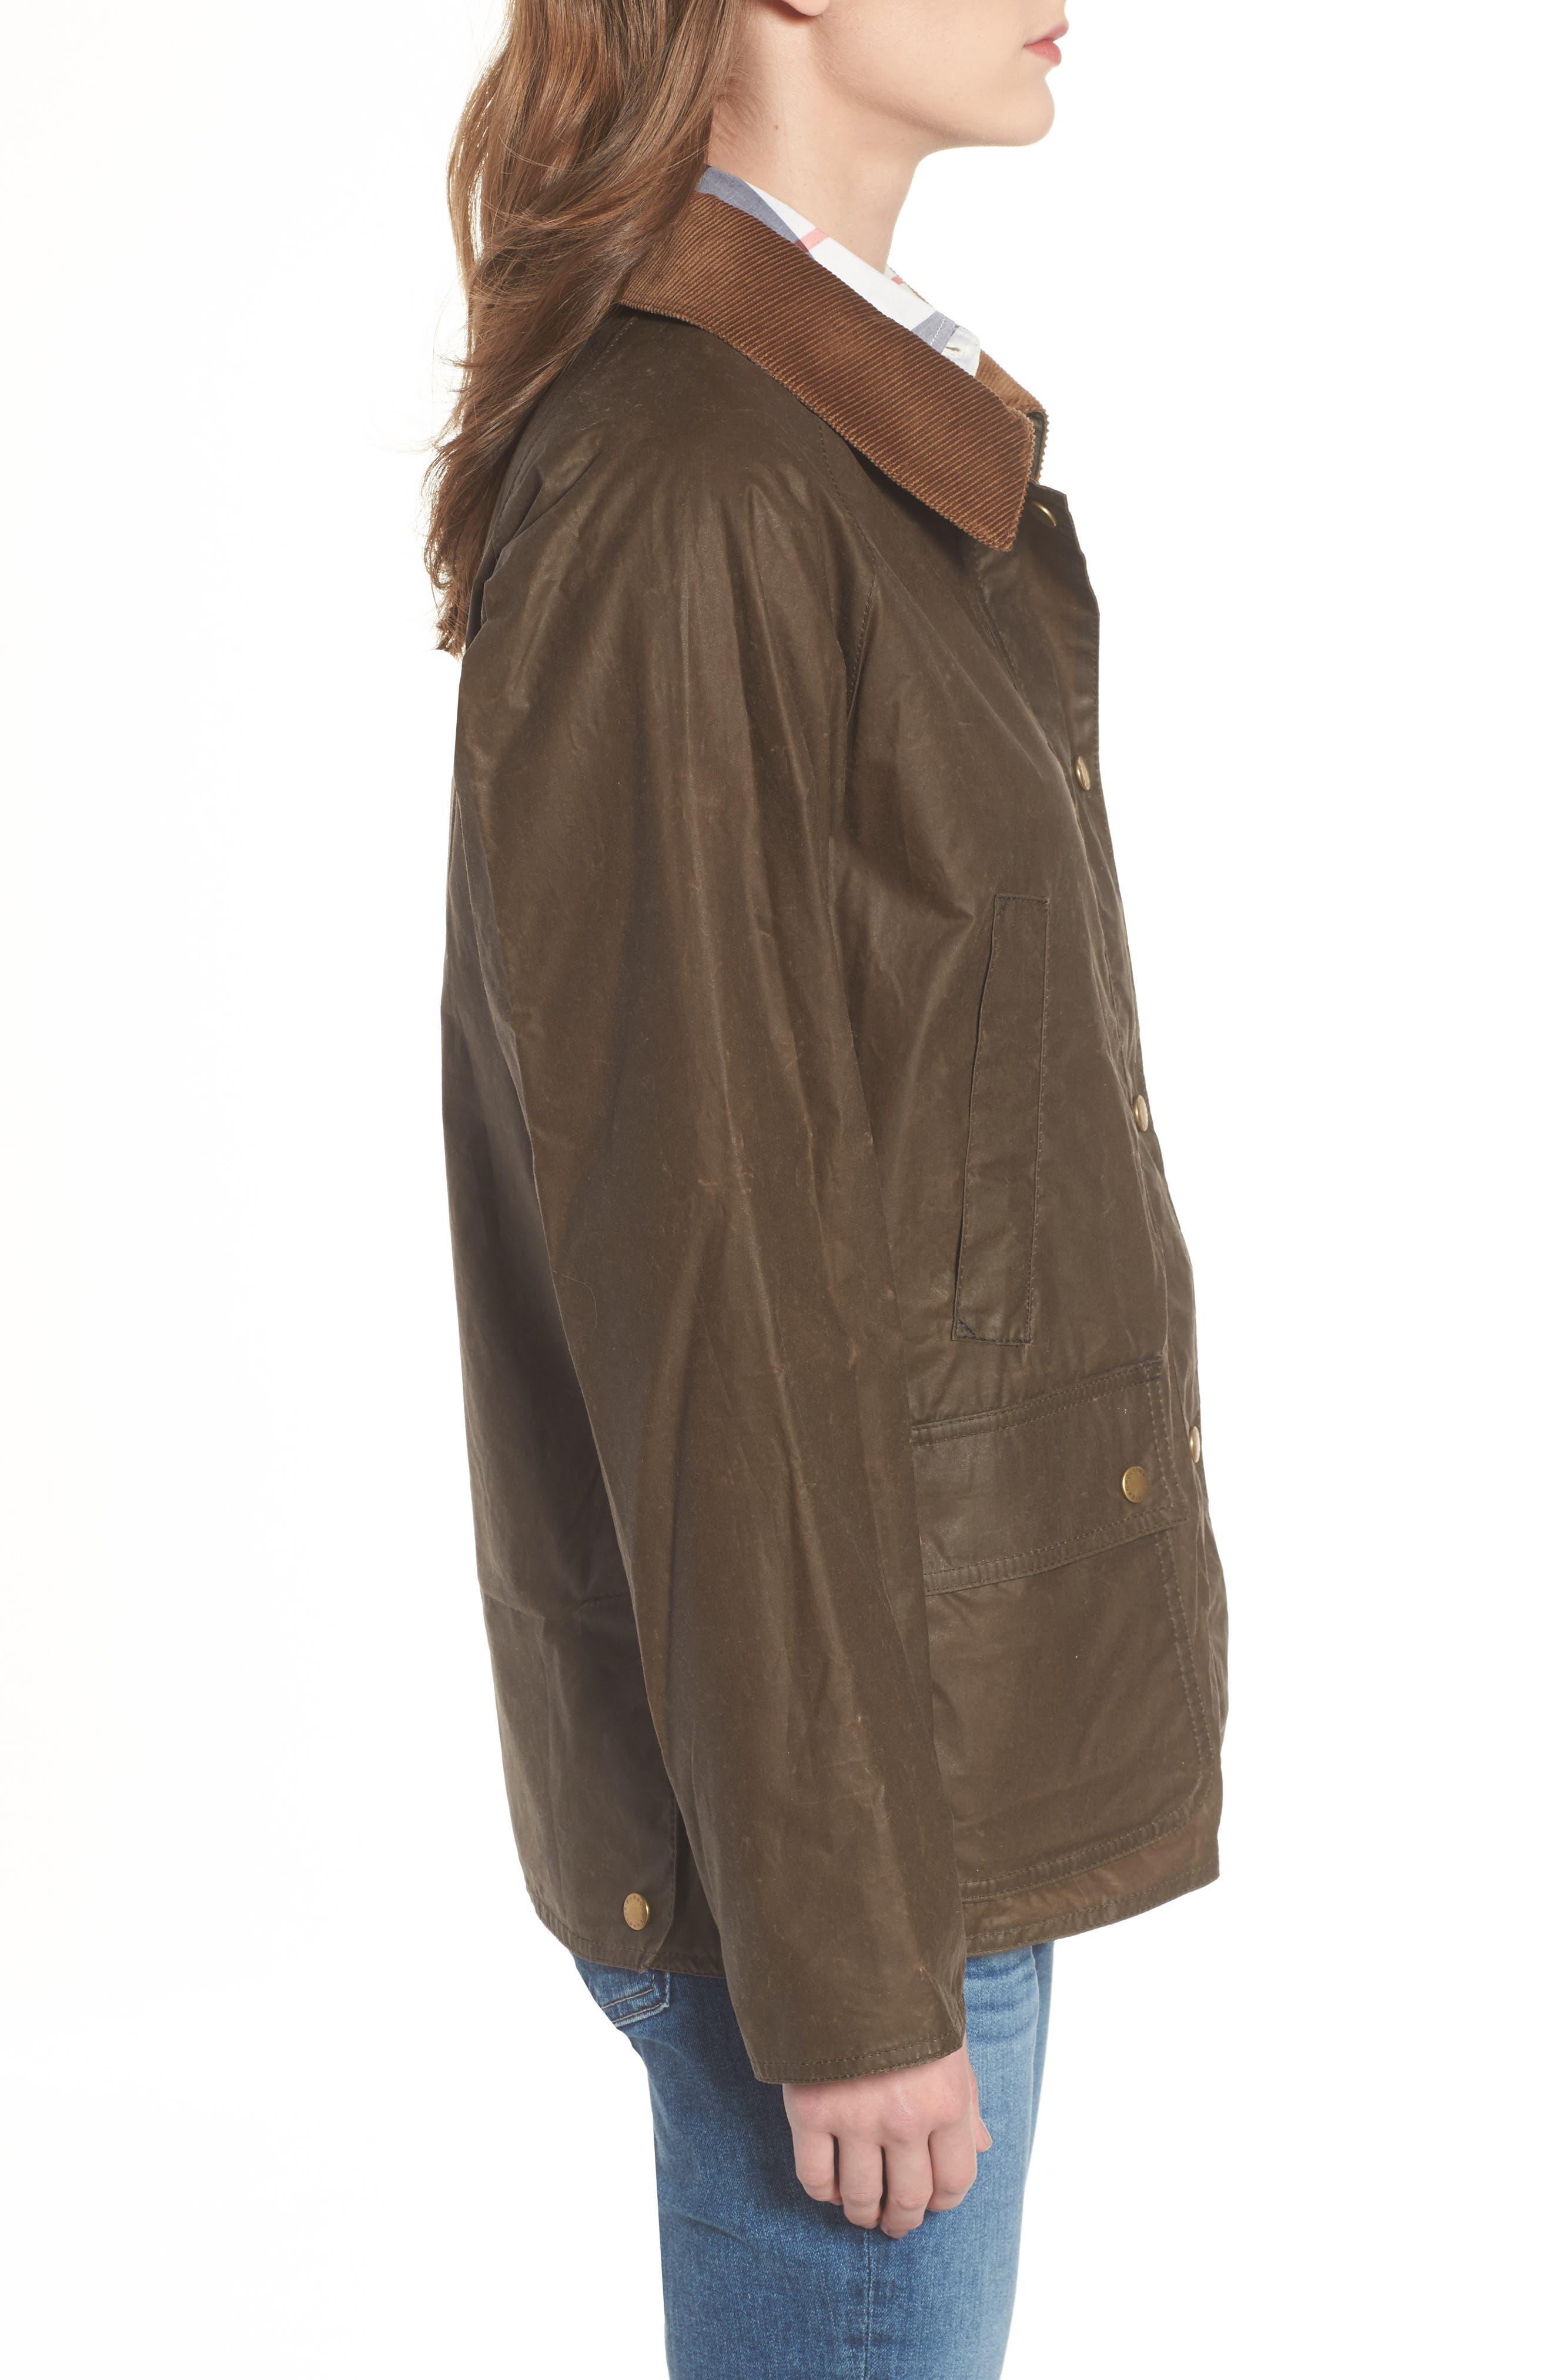 Acorn Water Resistant Waxed Cotton Jacket,                             Alternate thumbnail 3, color,                             230